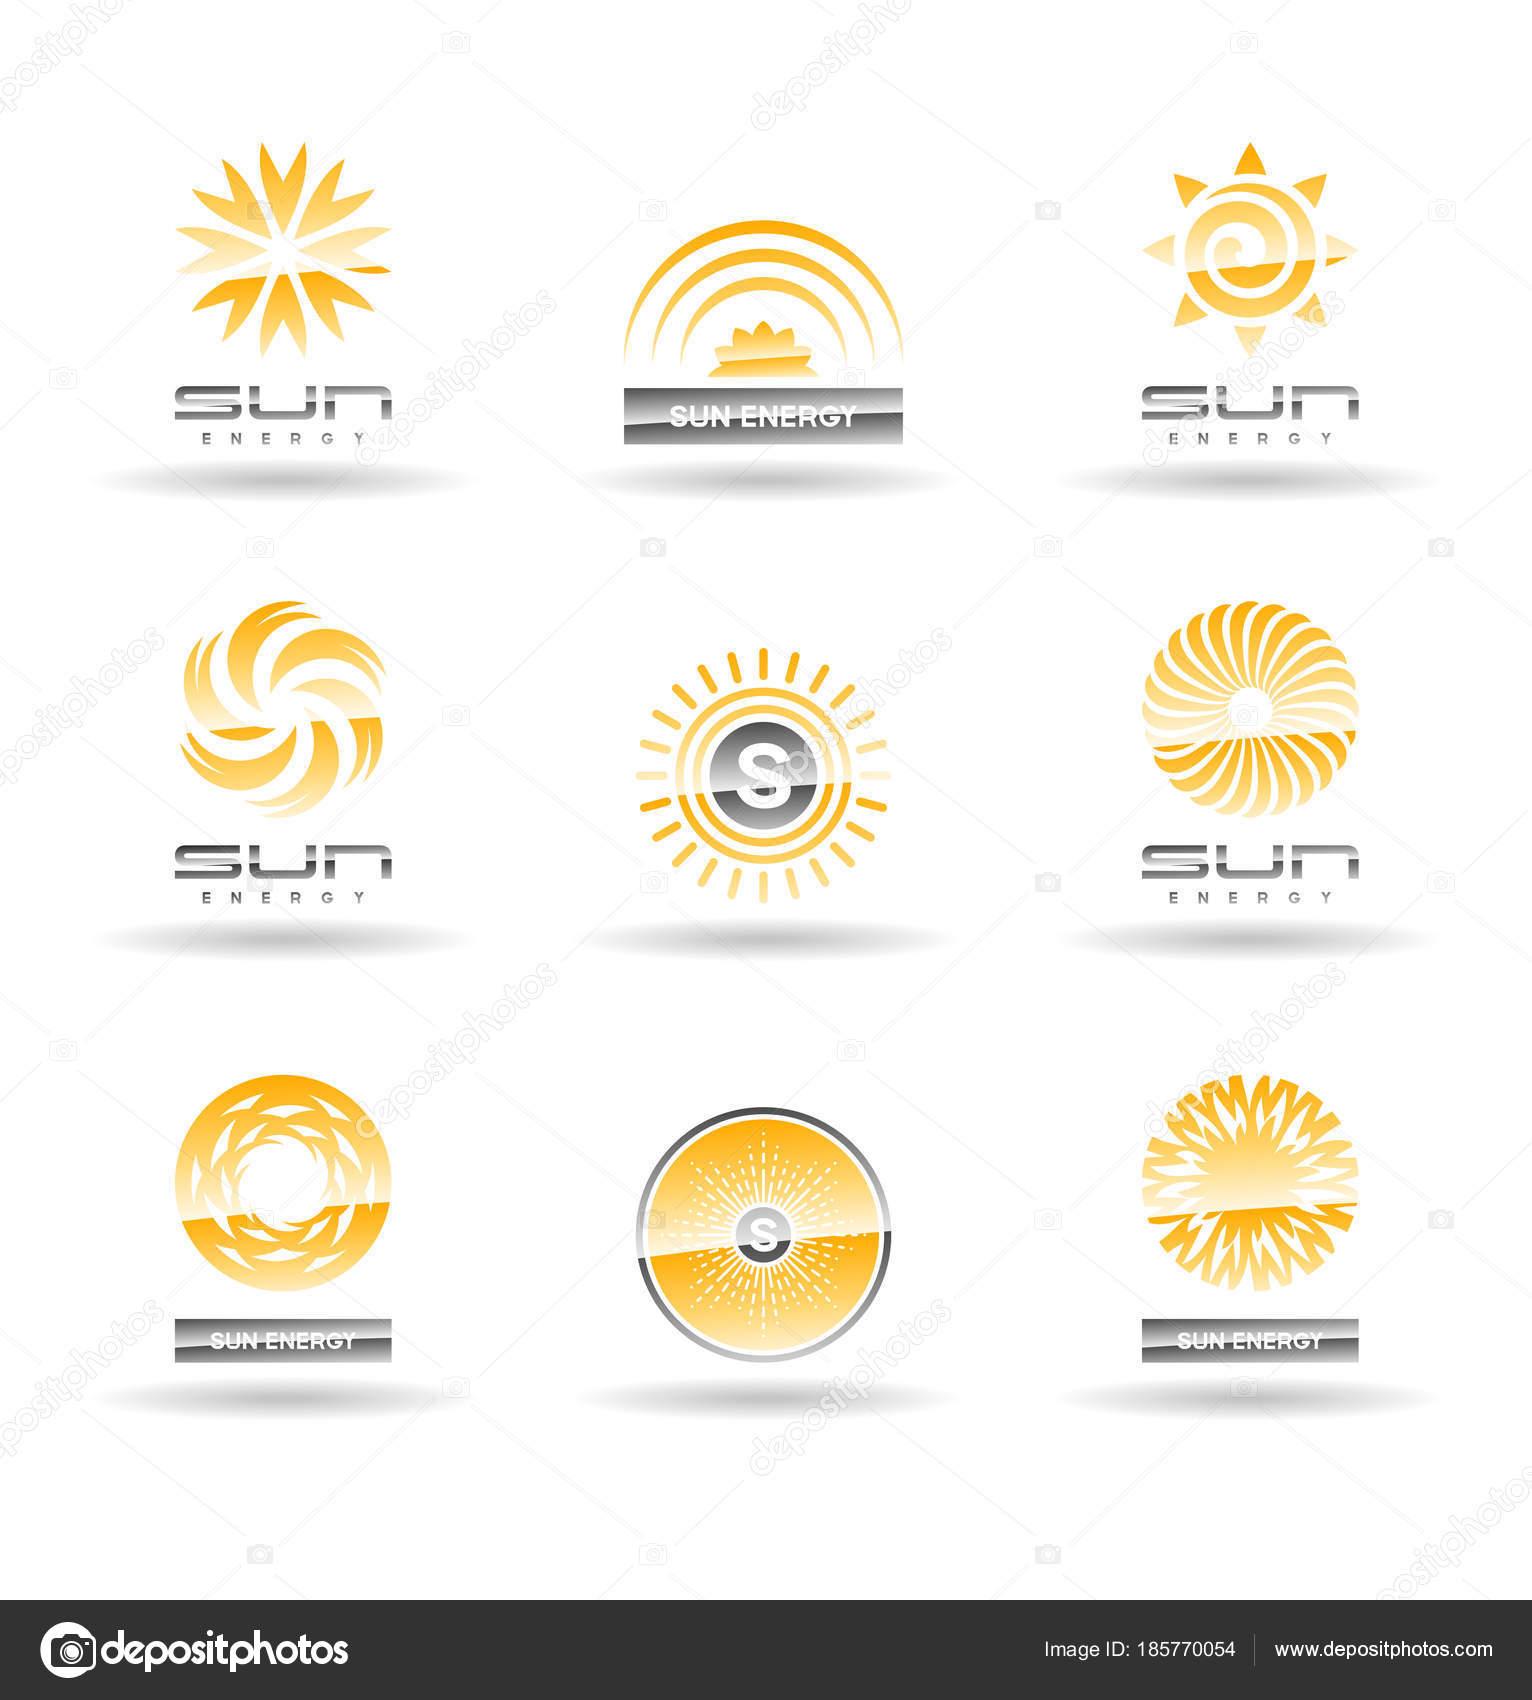 Sun Solar Energy Vector Logo Design Elements Icons — Stock